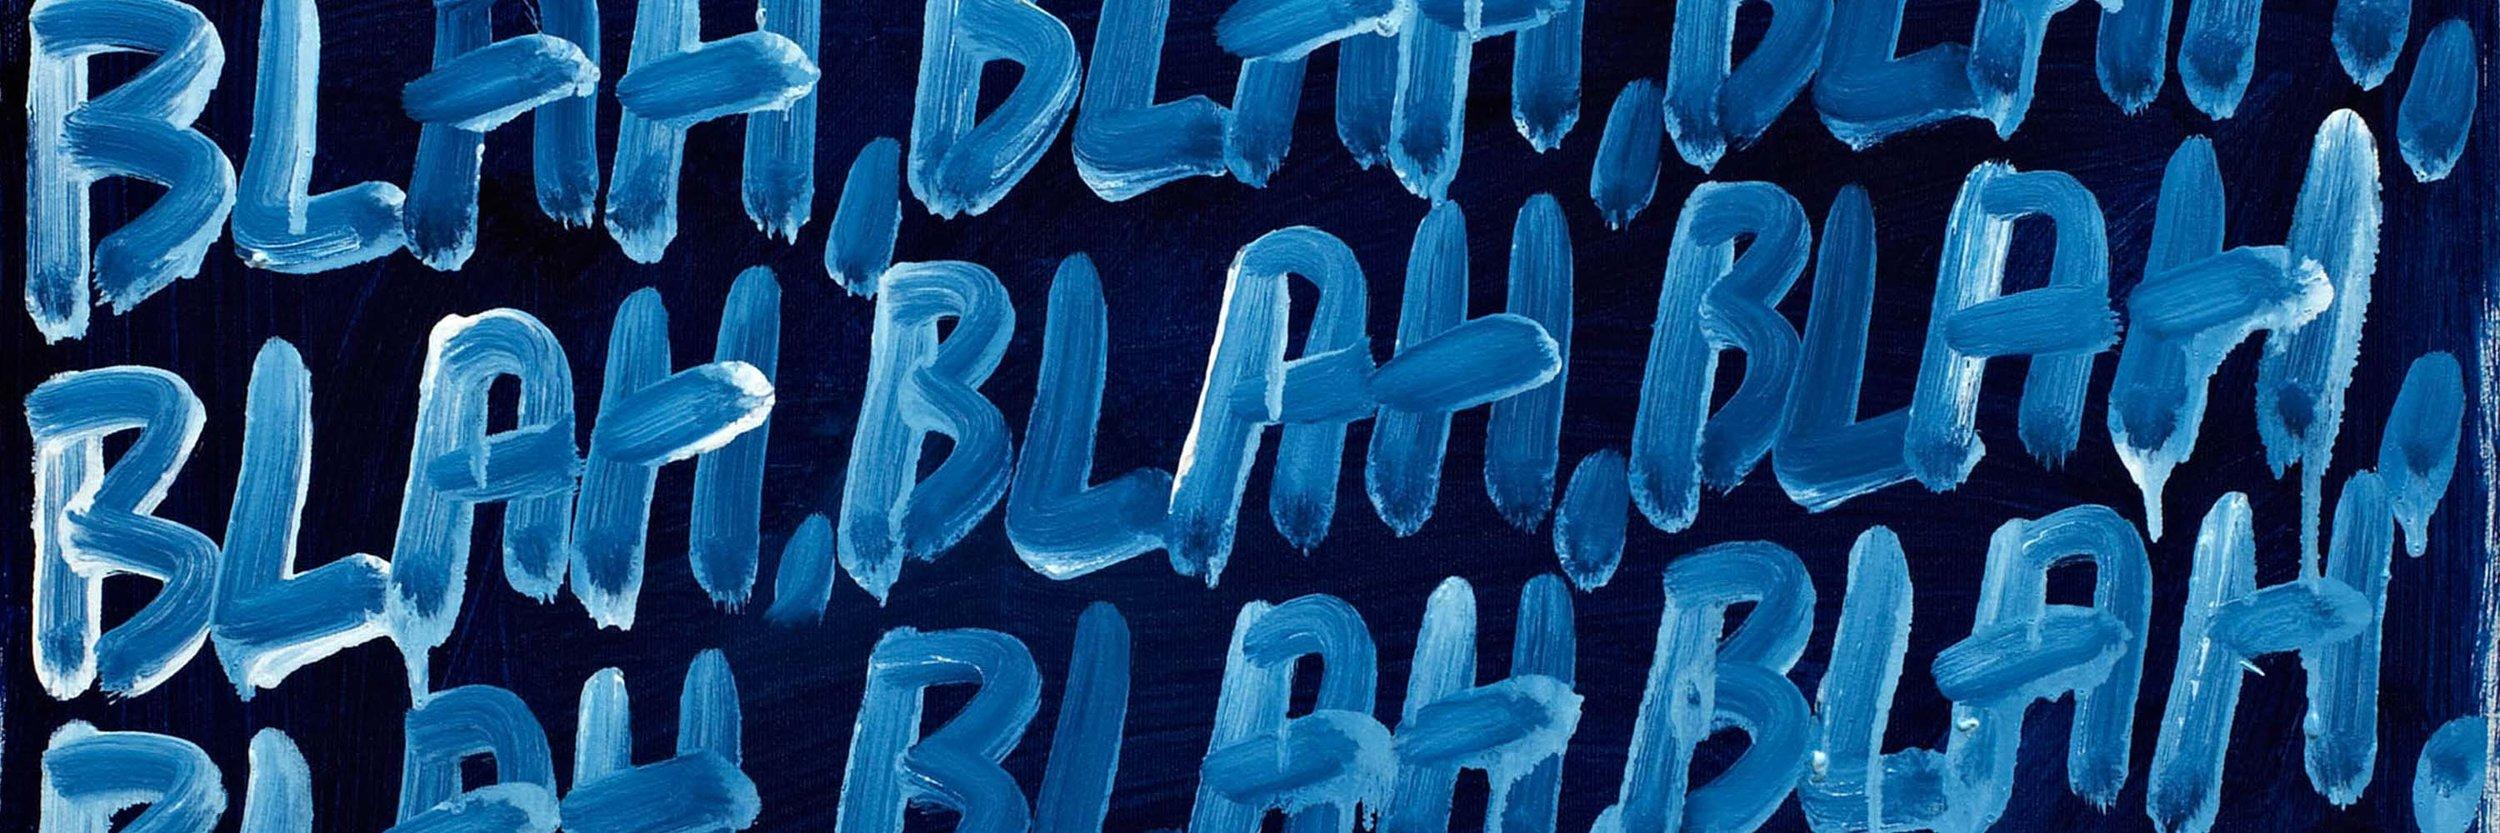 bochner-blah-blah-blah-banner.jpg